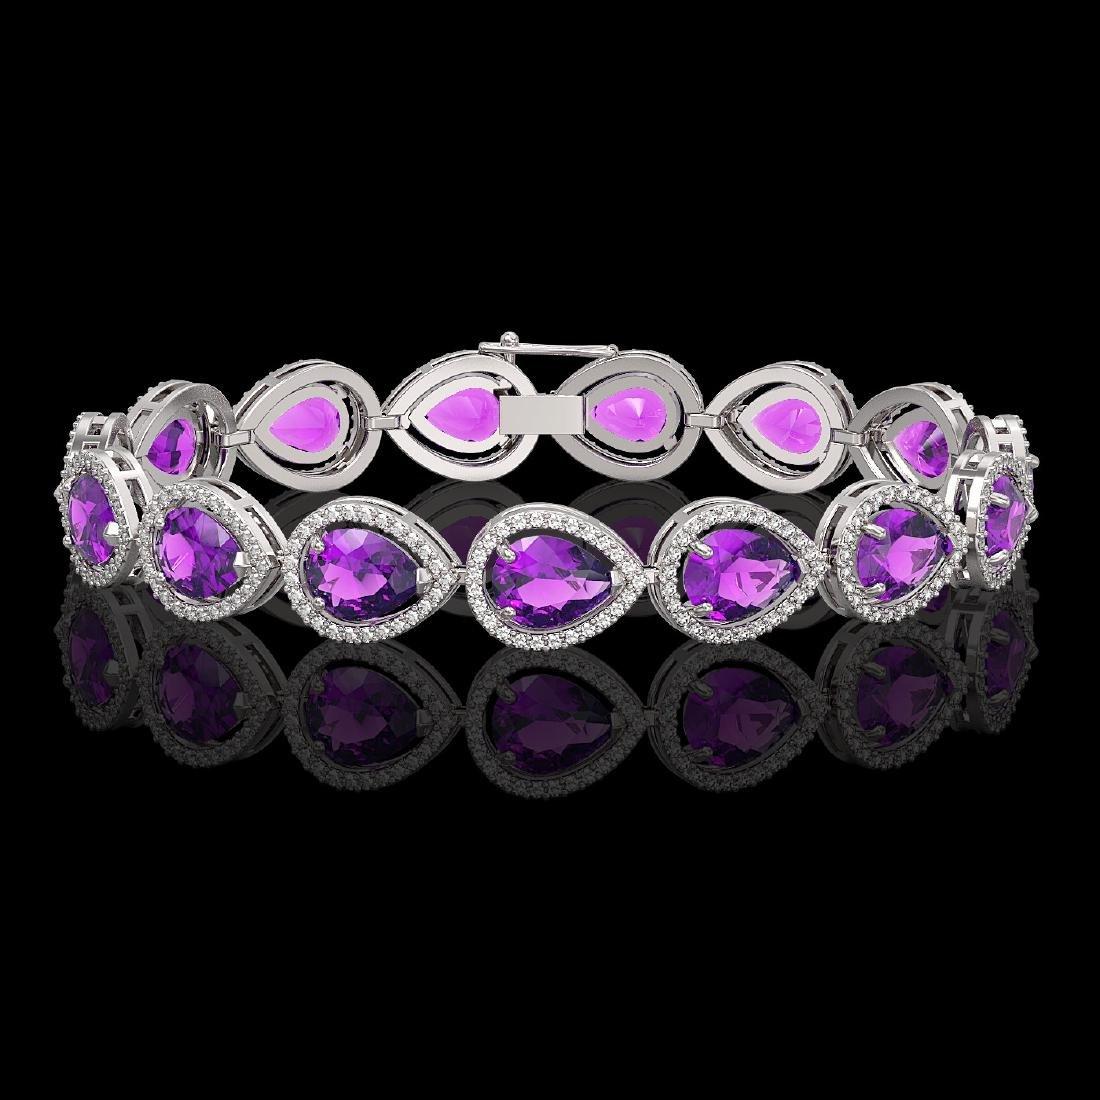 20.3 CTW Amethyst & Diamond Halo Bracelet 10K White